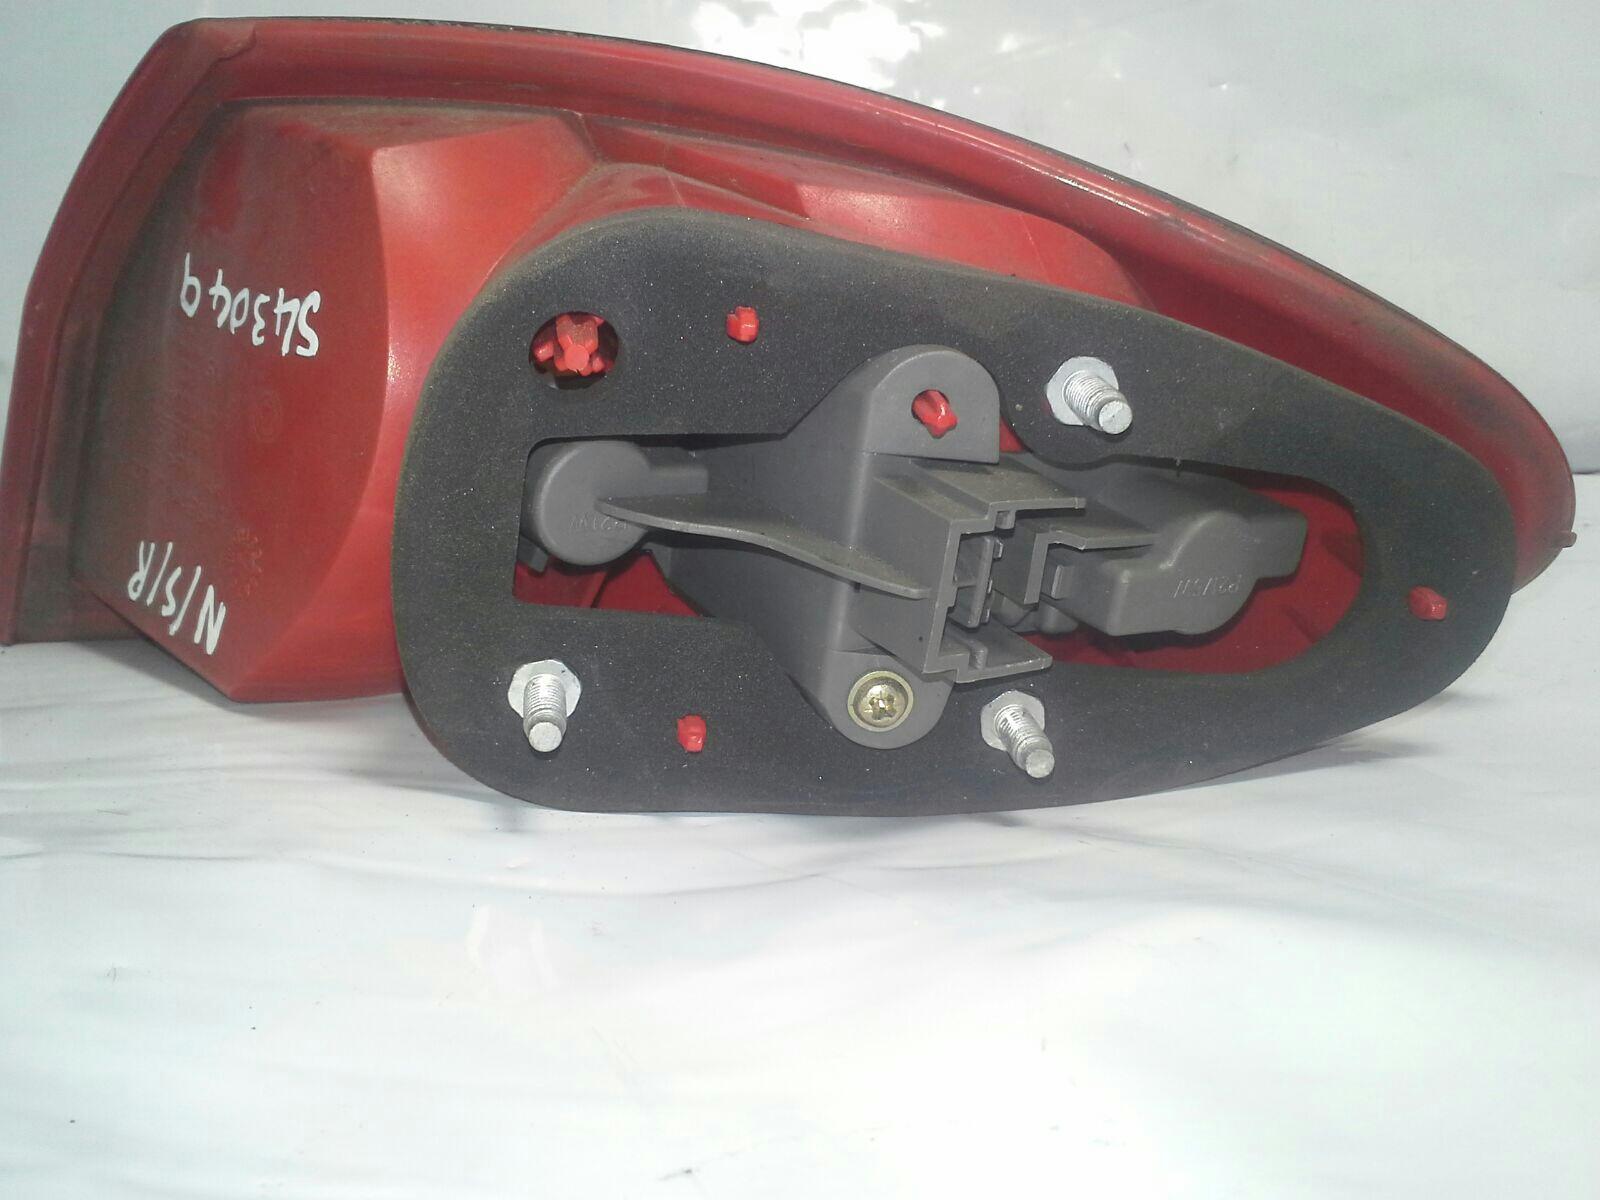 Alfa Romeo 147 2001 To 2006 Lamp Assembly Rear Lh Petrol Manual Tail Lights 2002 Nsr Passengers Light 5145188